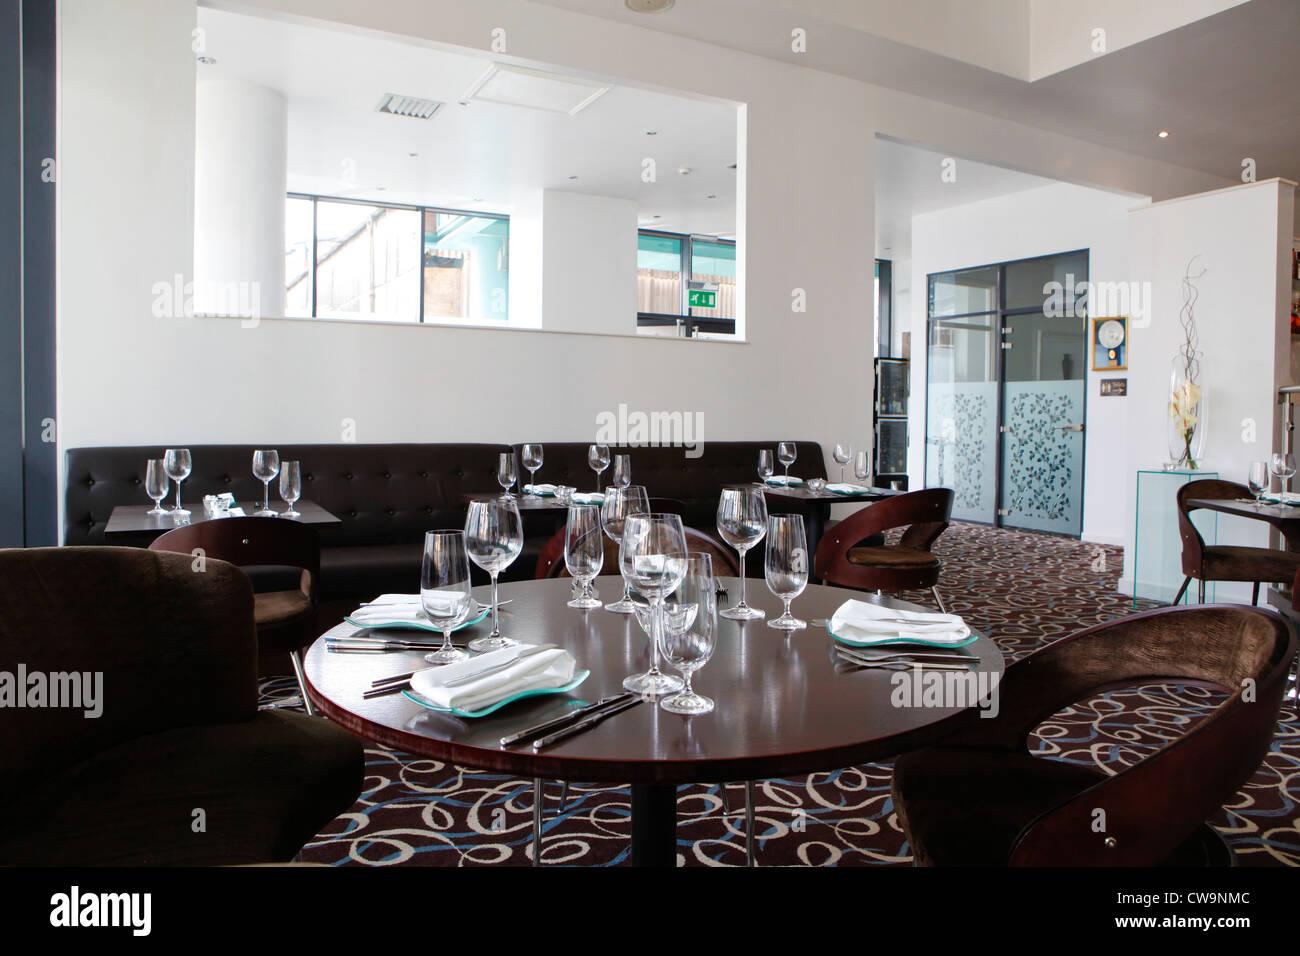 Loves restaurant, Birmingham, West Midlands, England, UK - Stock Image